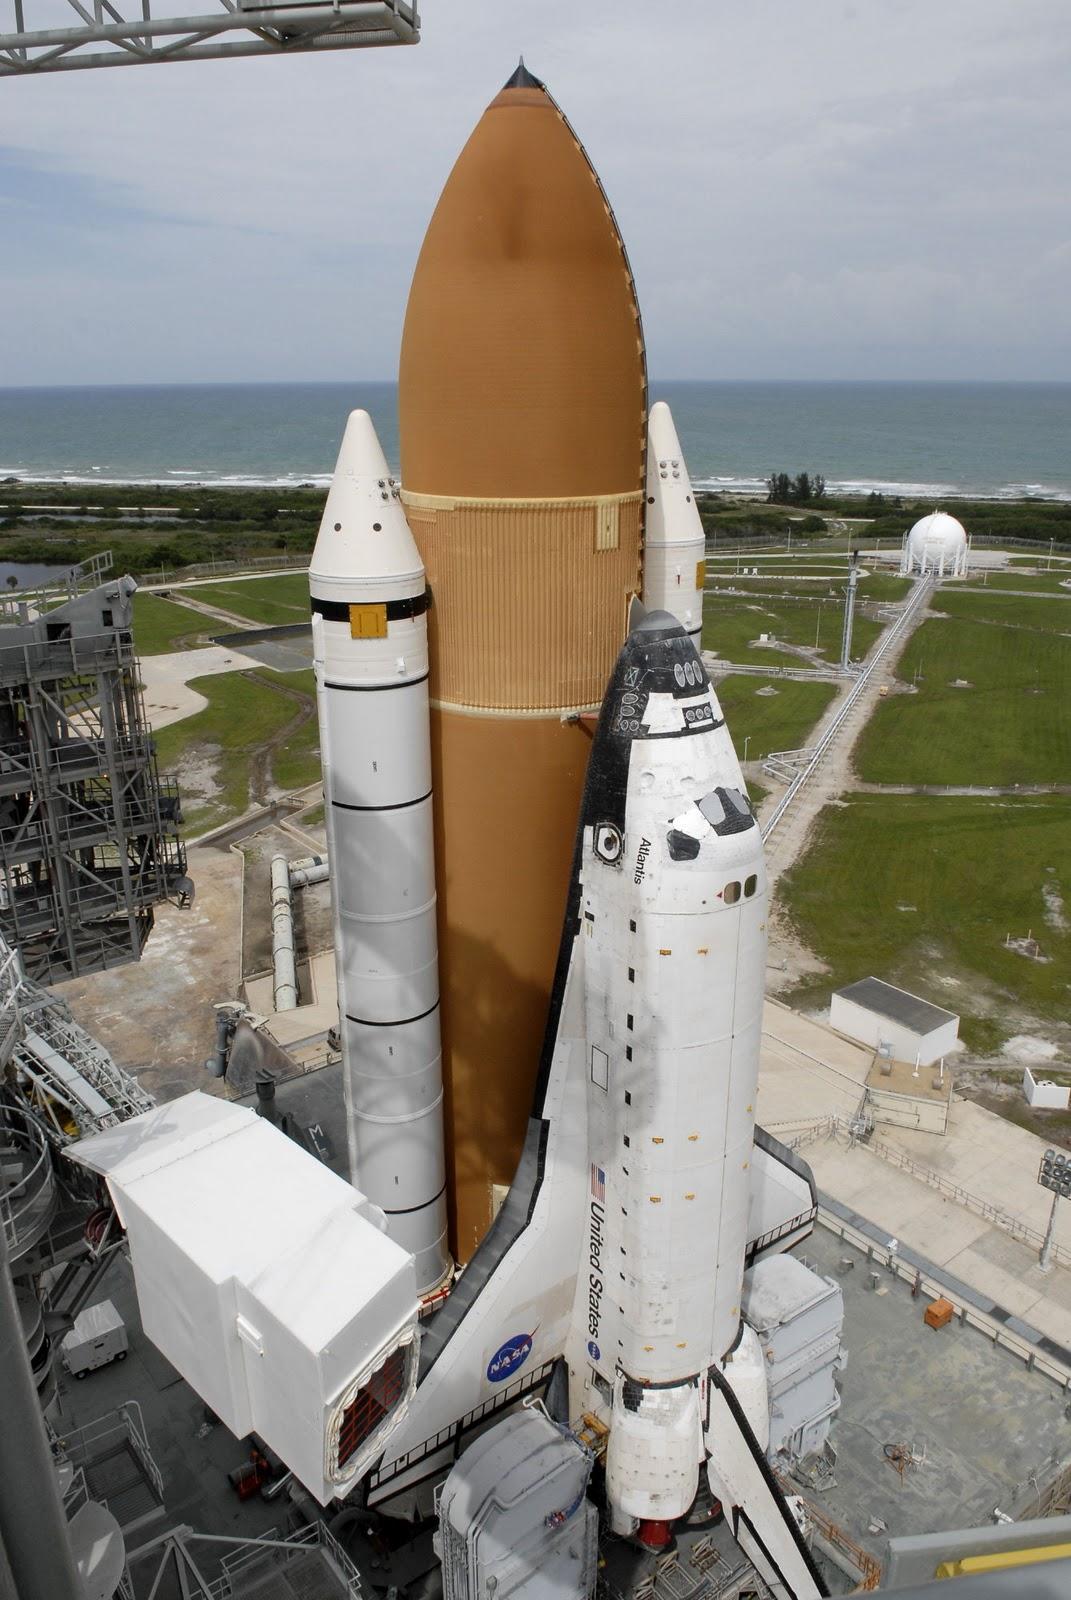 space shuttle - photo #27